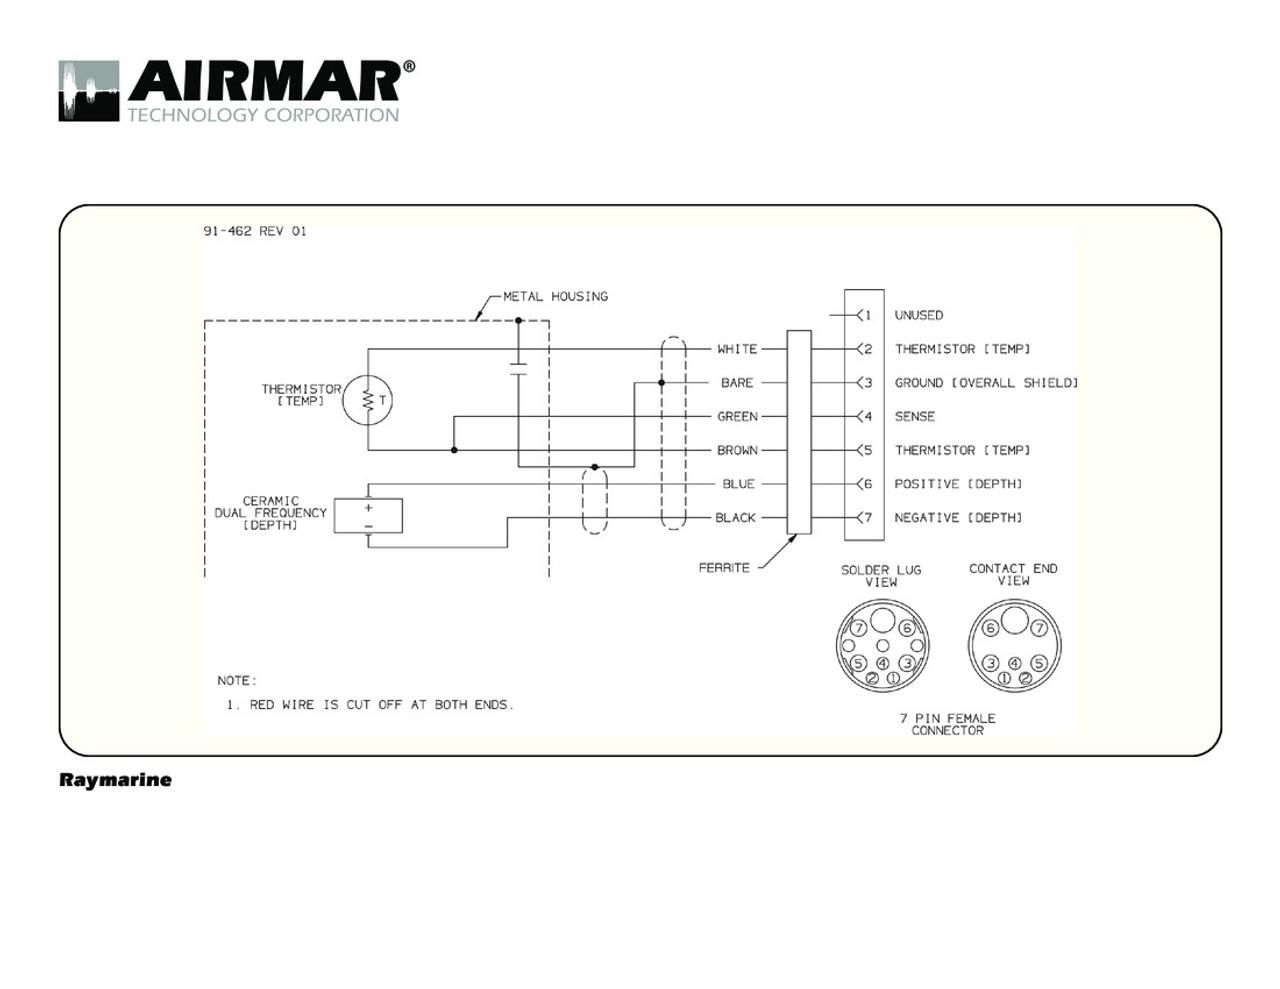 medium resolution of raymarine wiring diagrams wiring diagram airmar wiring diagram raymarine 7 pin d t